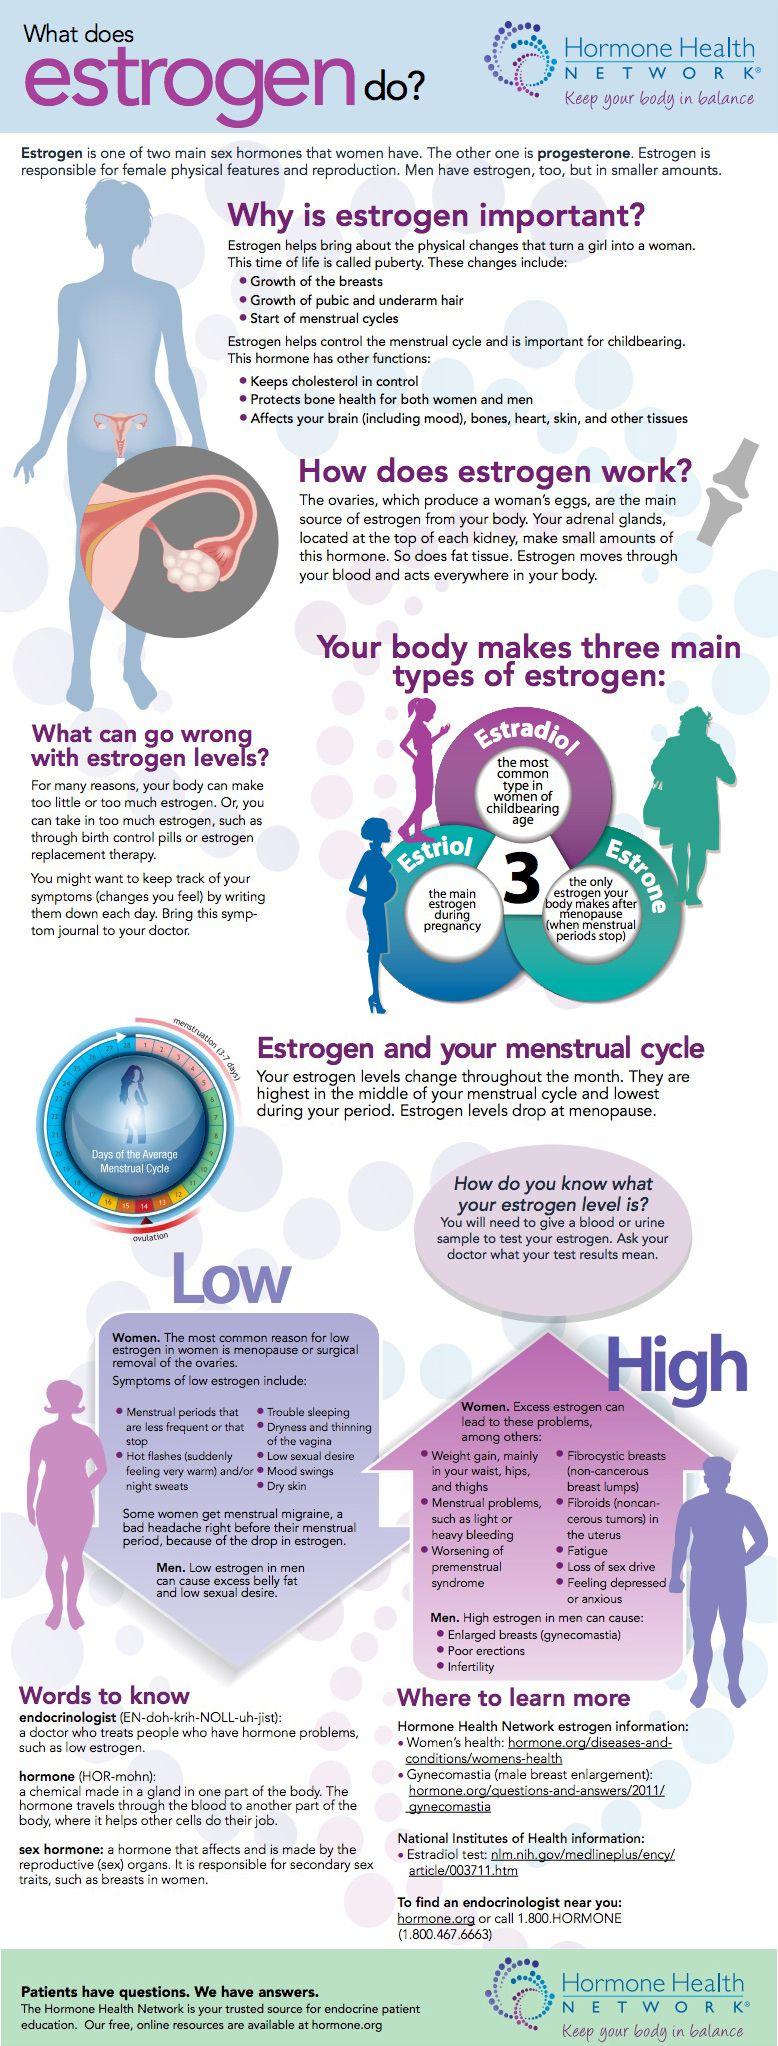 Estrogen Infographic | HEALTH | Health, wellbeing, Health matters